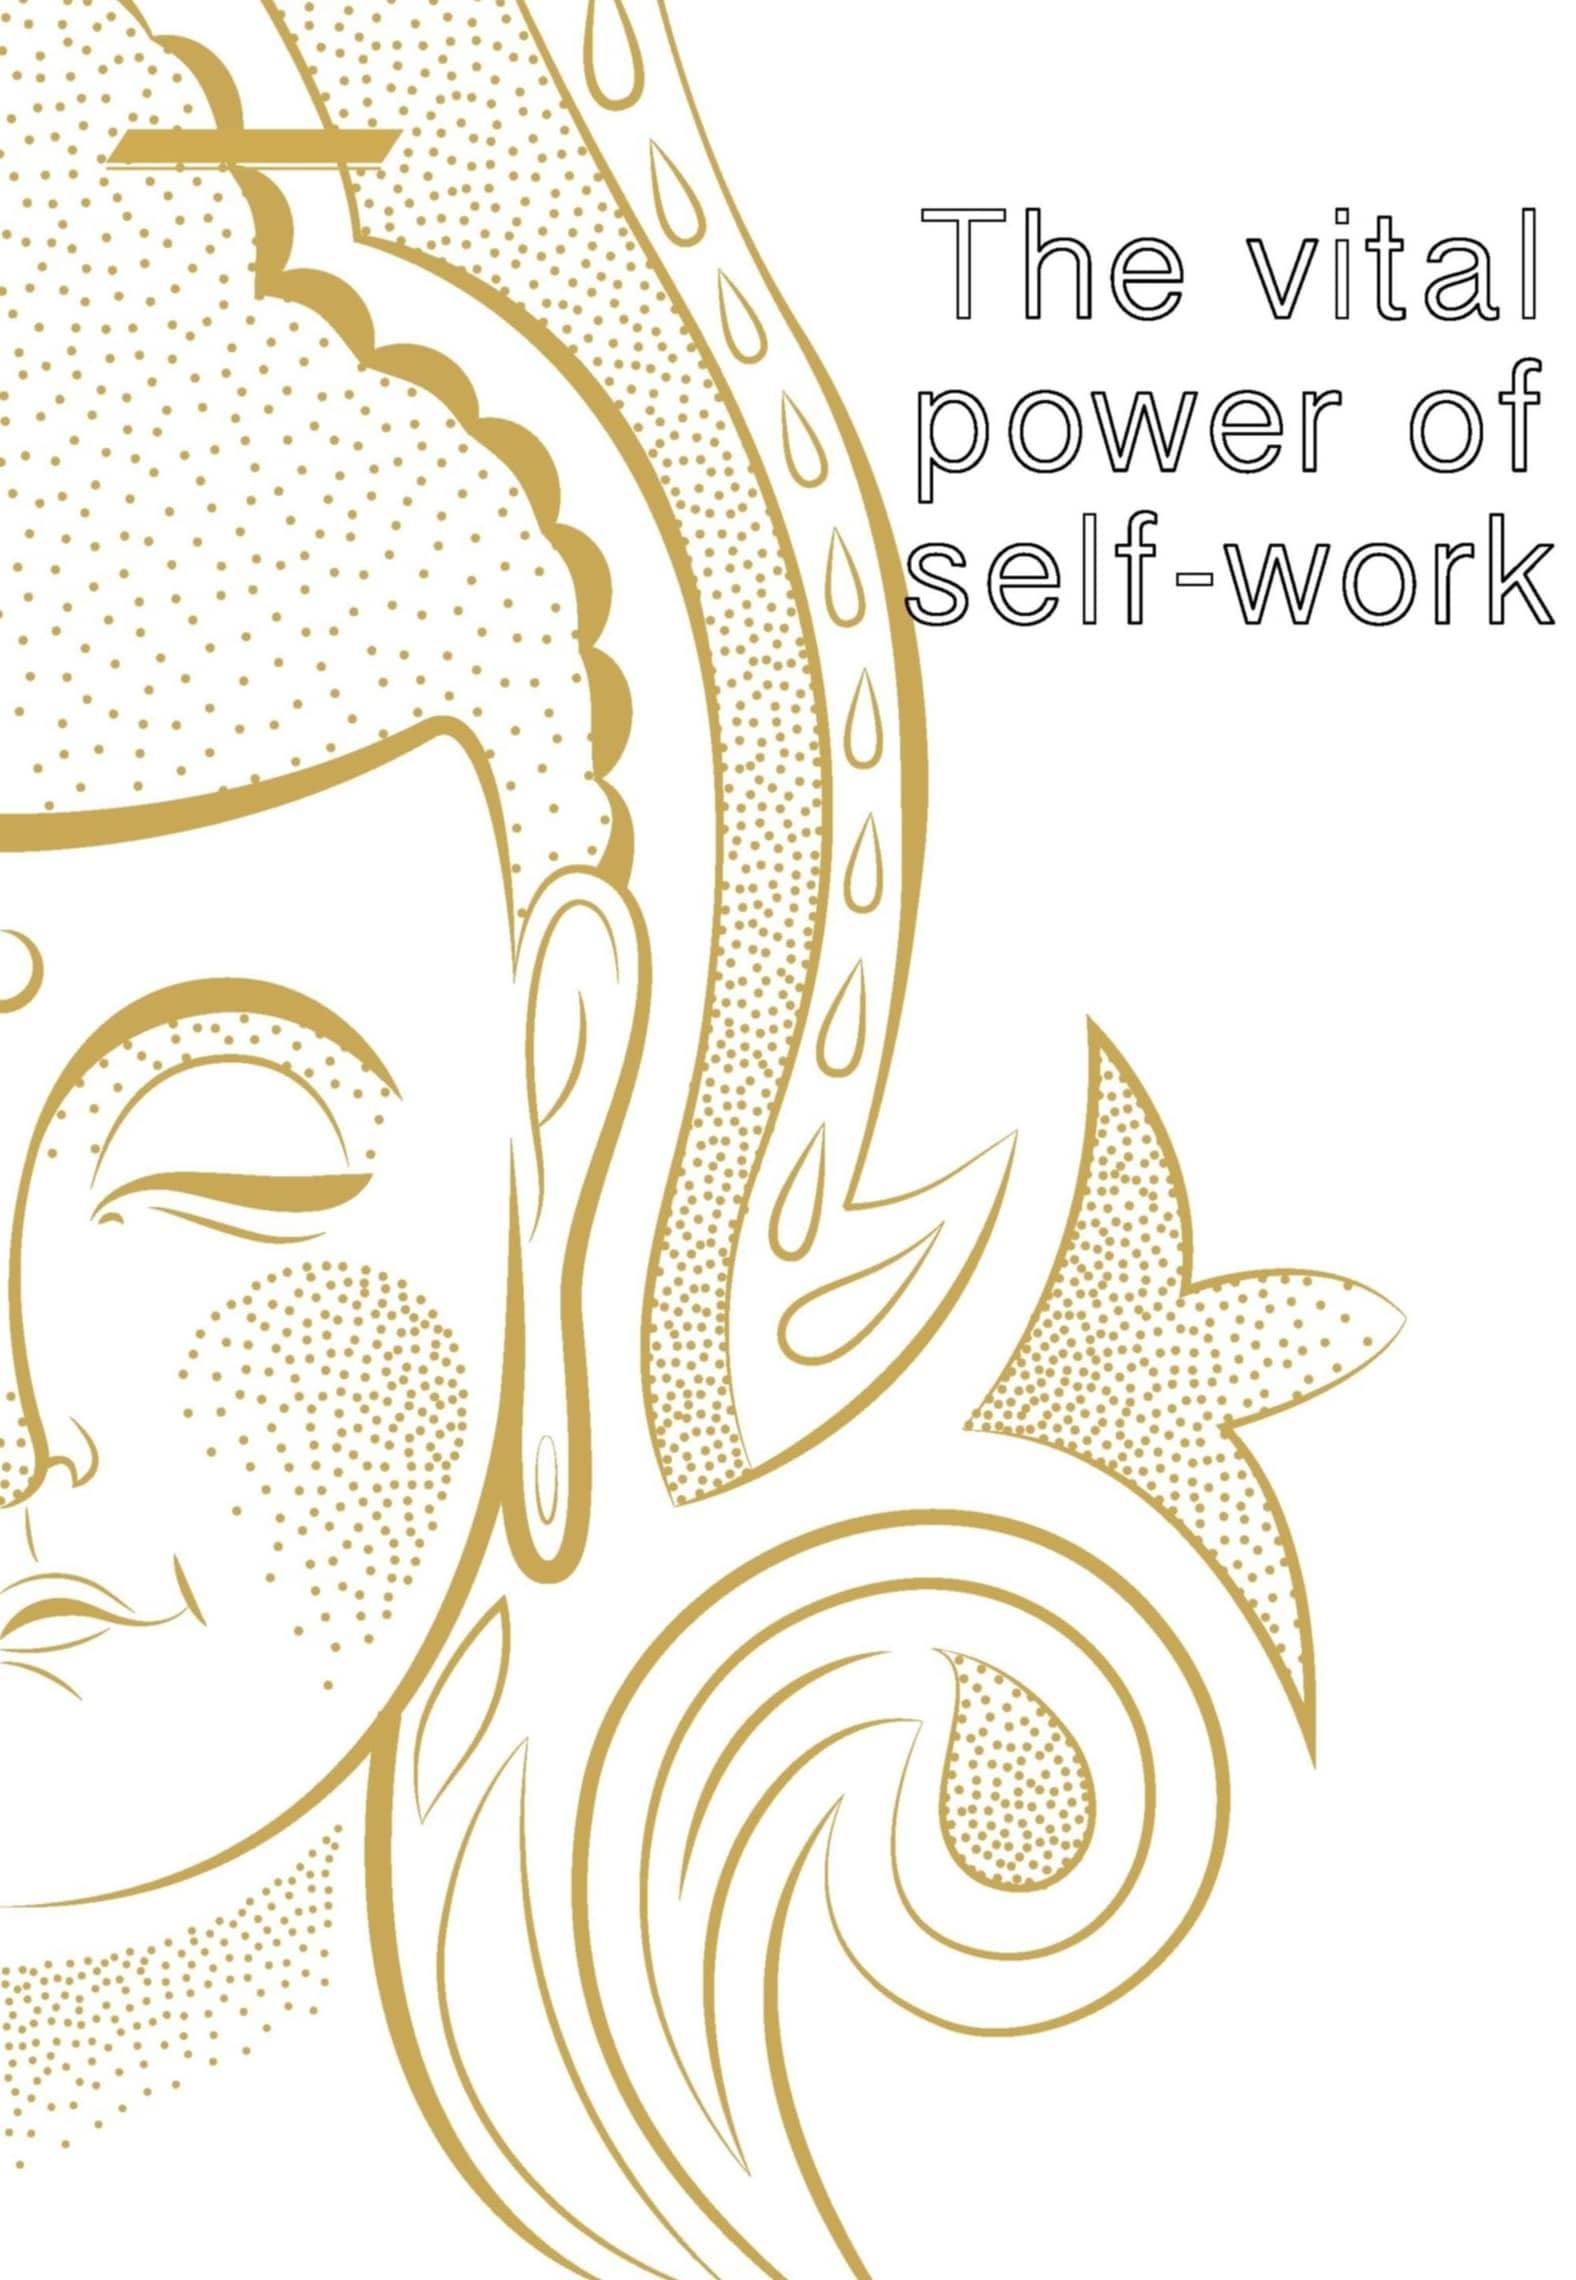 The vital power of self-work